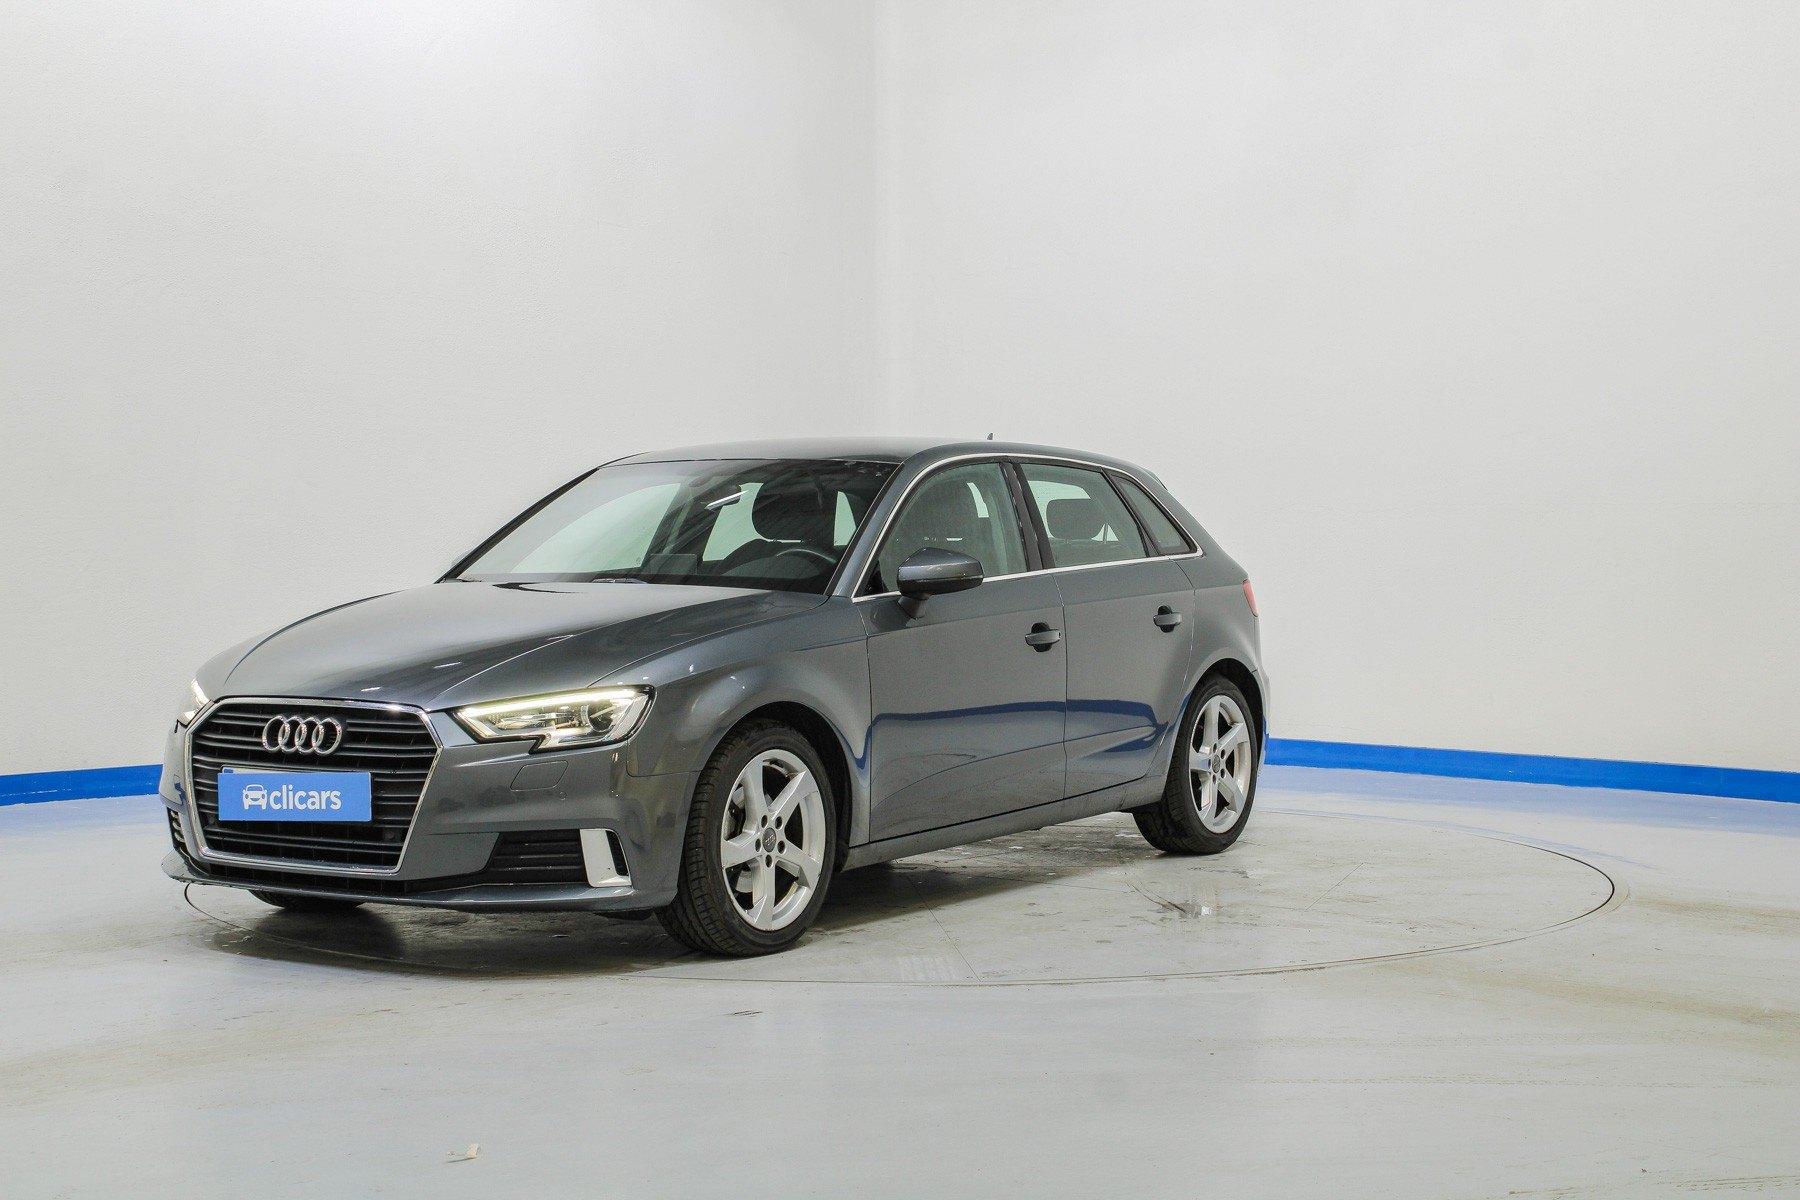 Audi A3 Gasolina 1.4 TFSI CoD ultra 1